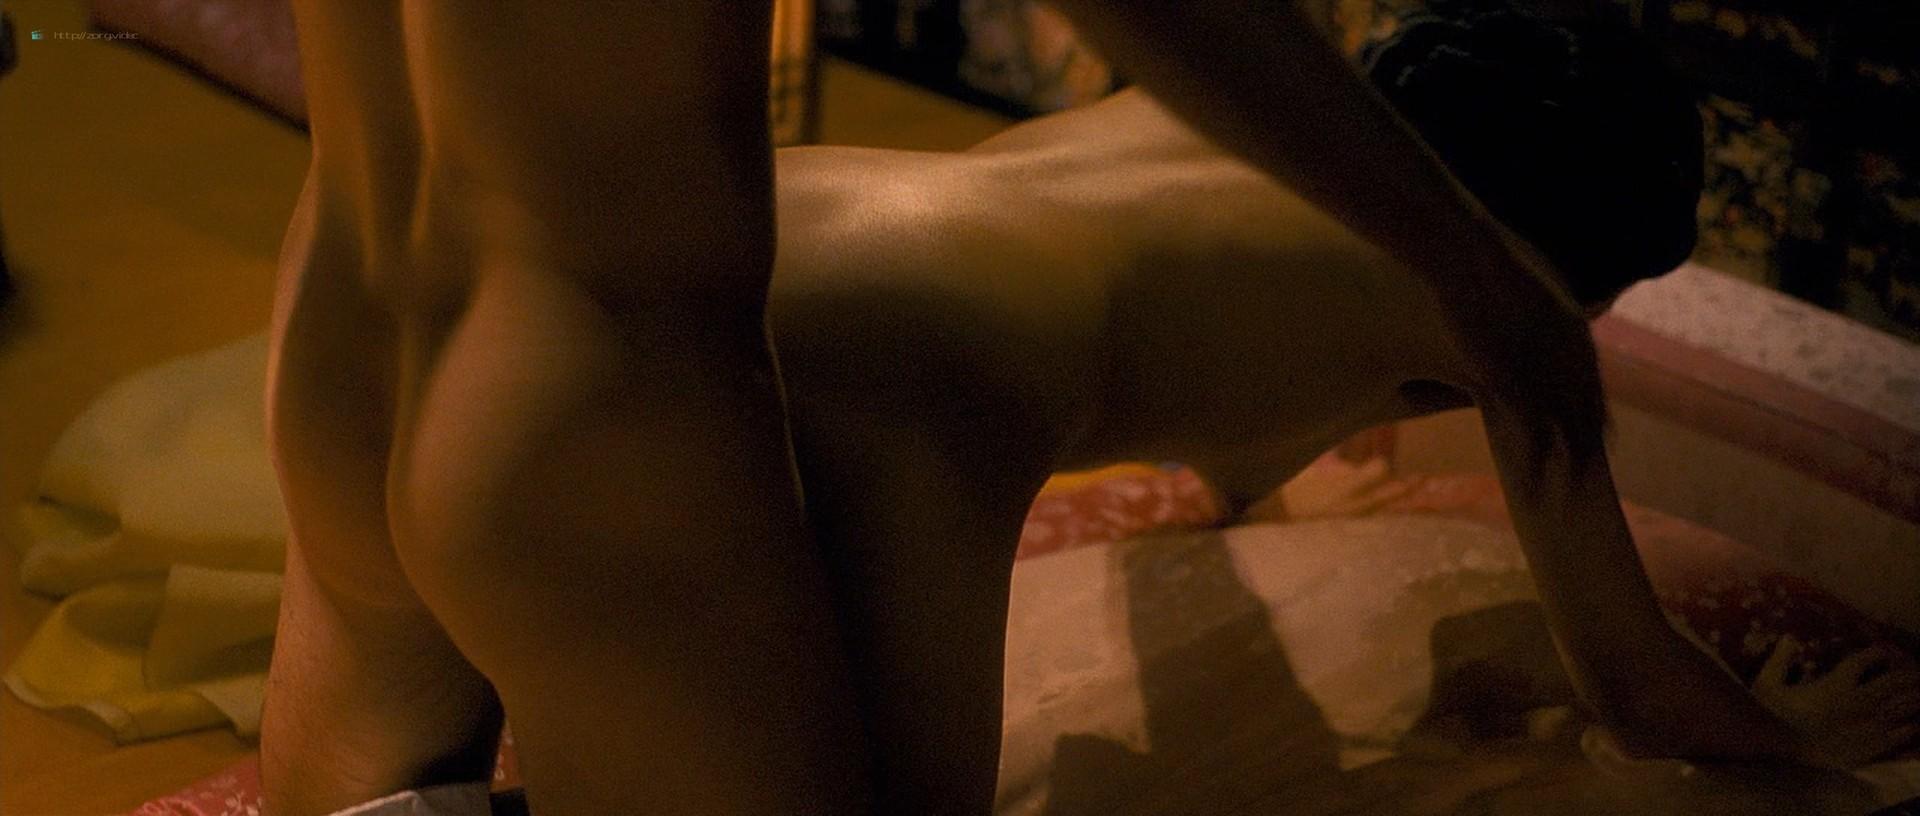 Cho Yeo-jeong nude sex Ryu Hyun-kyung nude too- The Servant (KR-2010) HD 1080p BluRay (6)